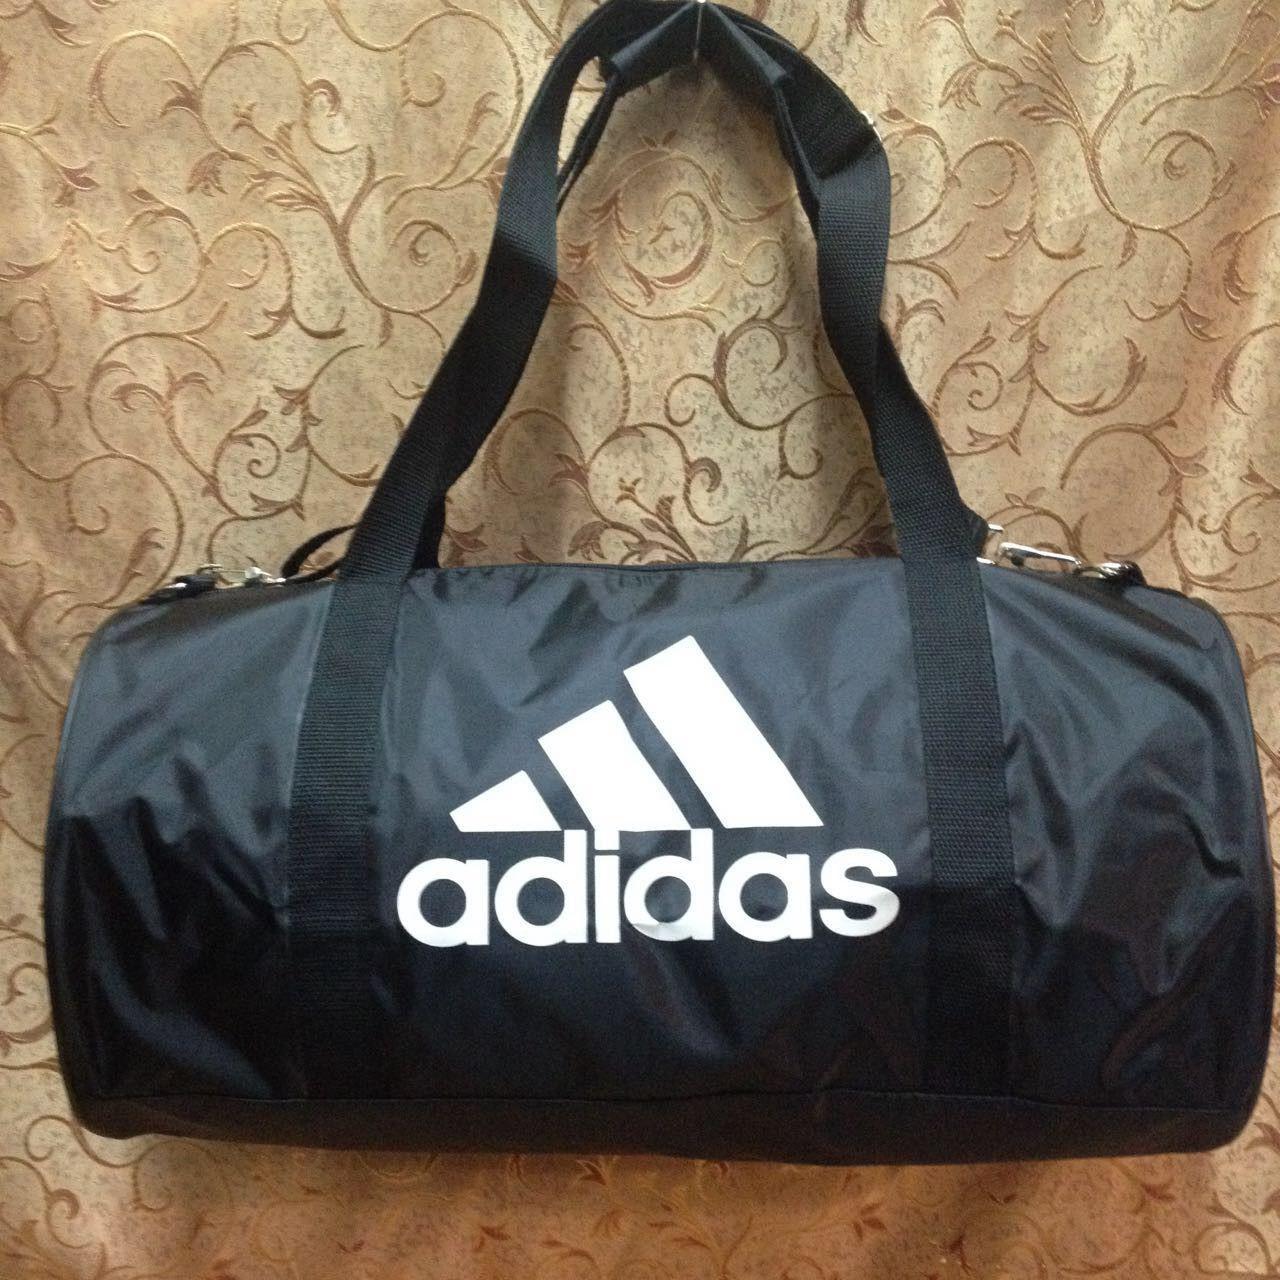 f0da6f45a7af Спортивная сумка-цилиндр Adidas, Адидас черная с белым: продажа ...